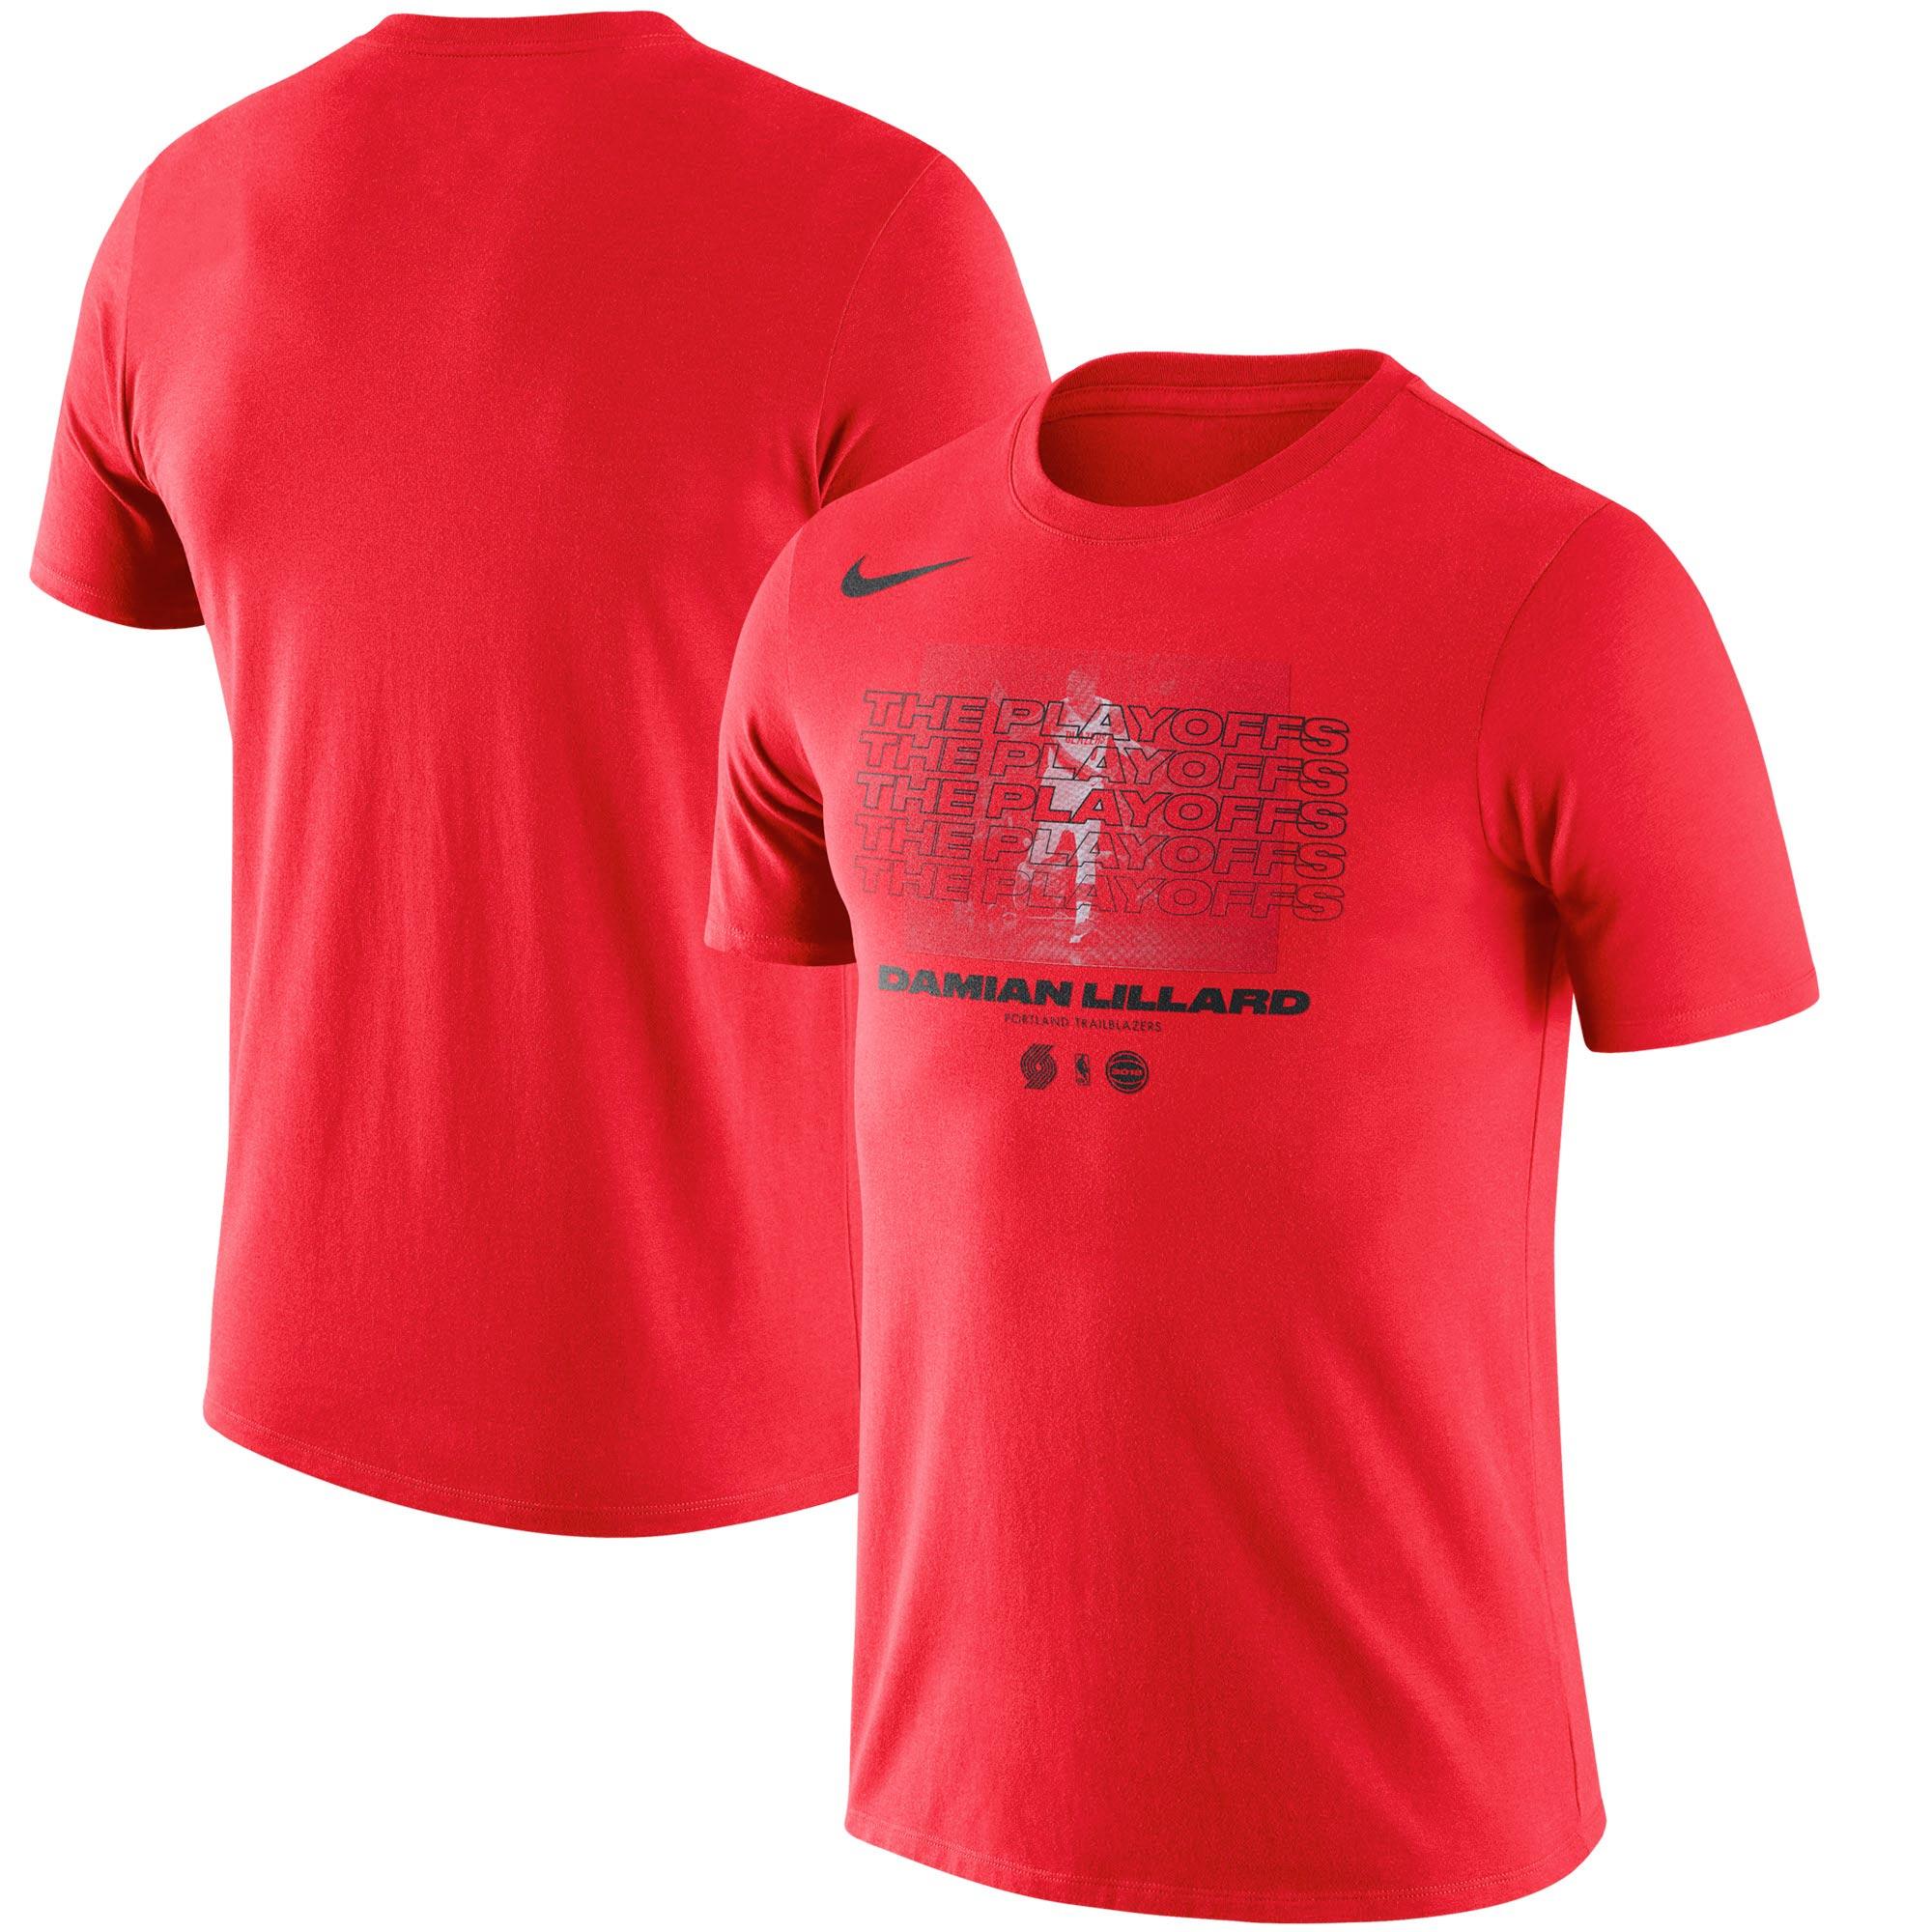 Damian Lillard Portland Trail Blazers Nike 2018 NBA Playoffs Player T-Shirt - Red